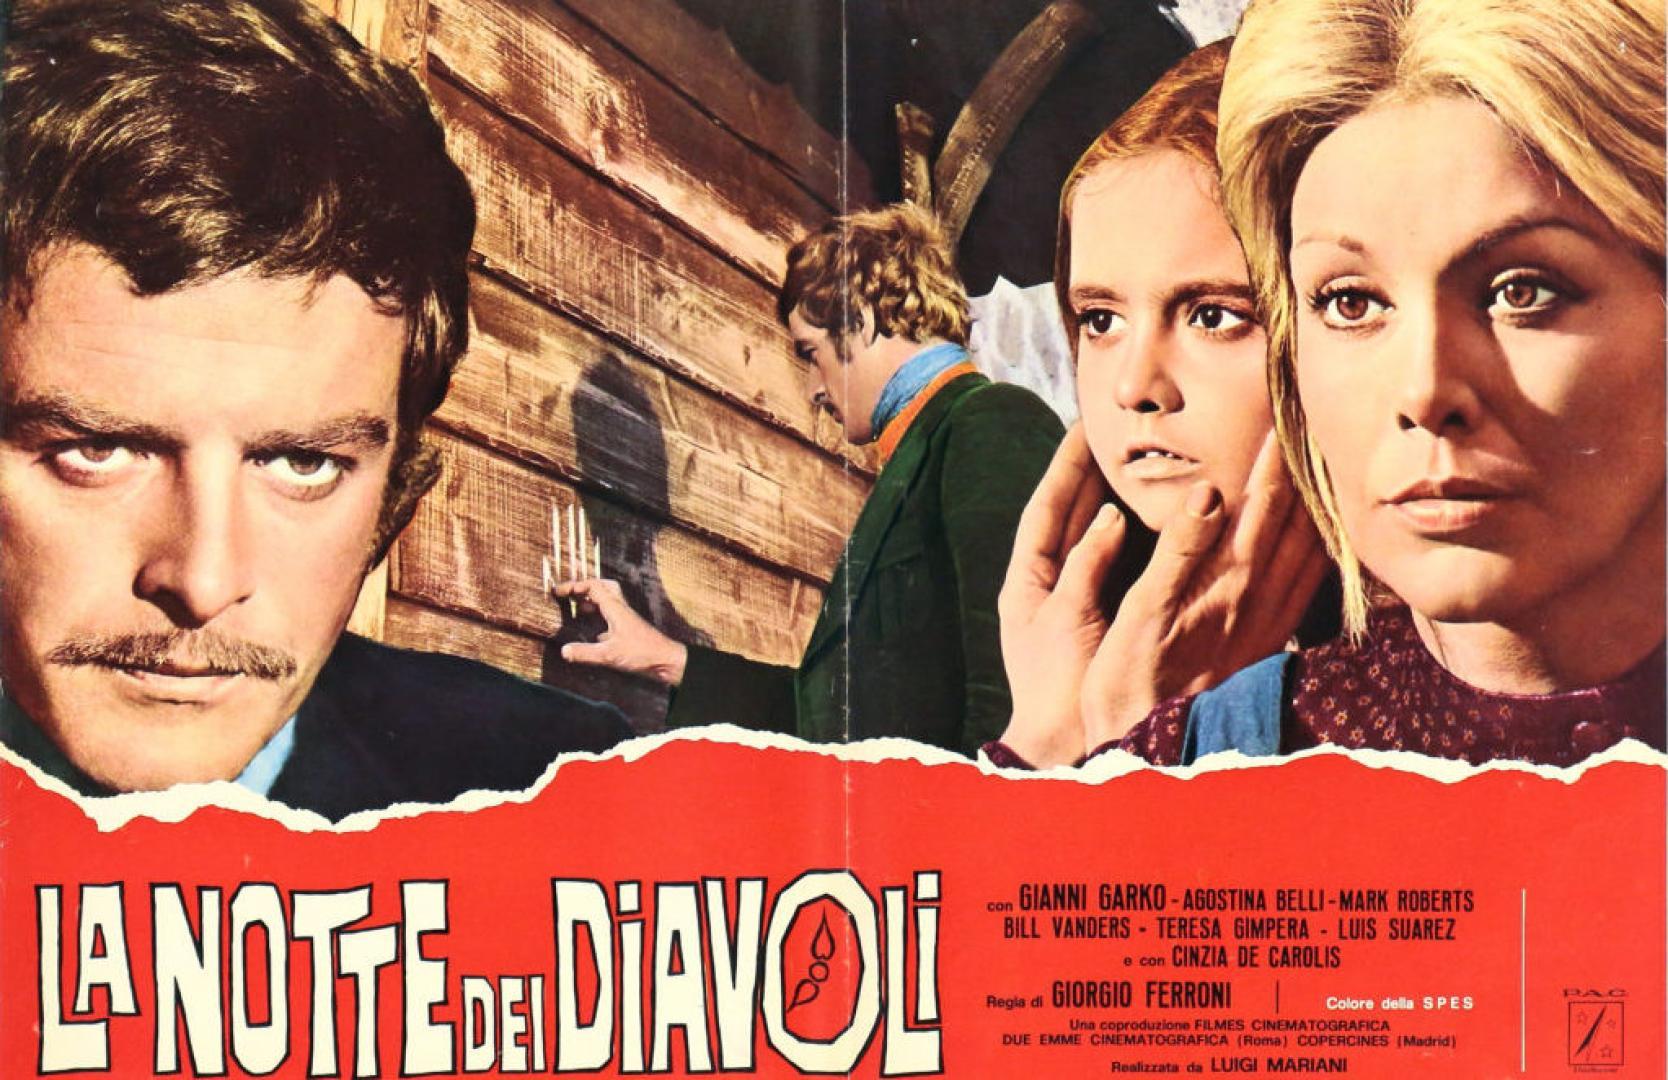 La notte dei diavoli / Night of the Devils / Az éjszaka ördögei (1972)